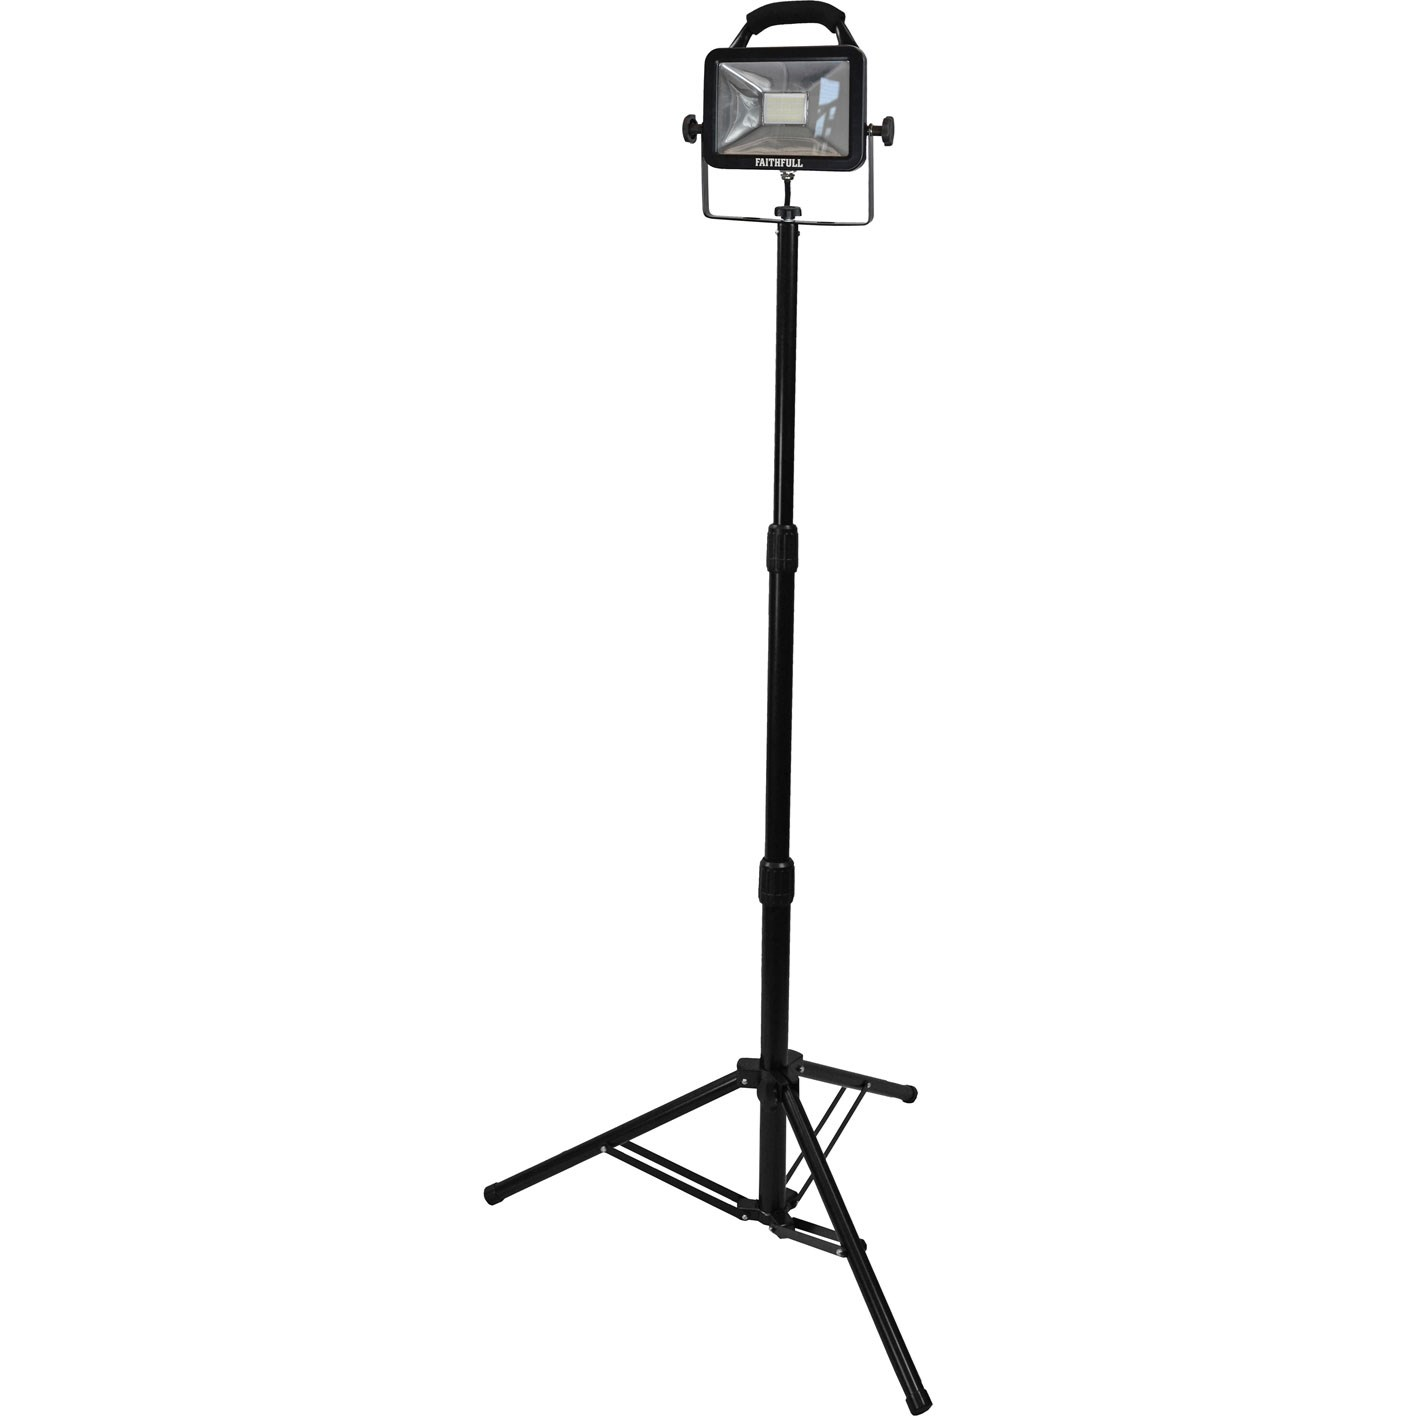 Faithfull 20W 110V Sitelight Single Tripod (Lumens1800))